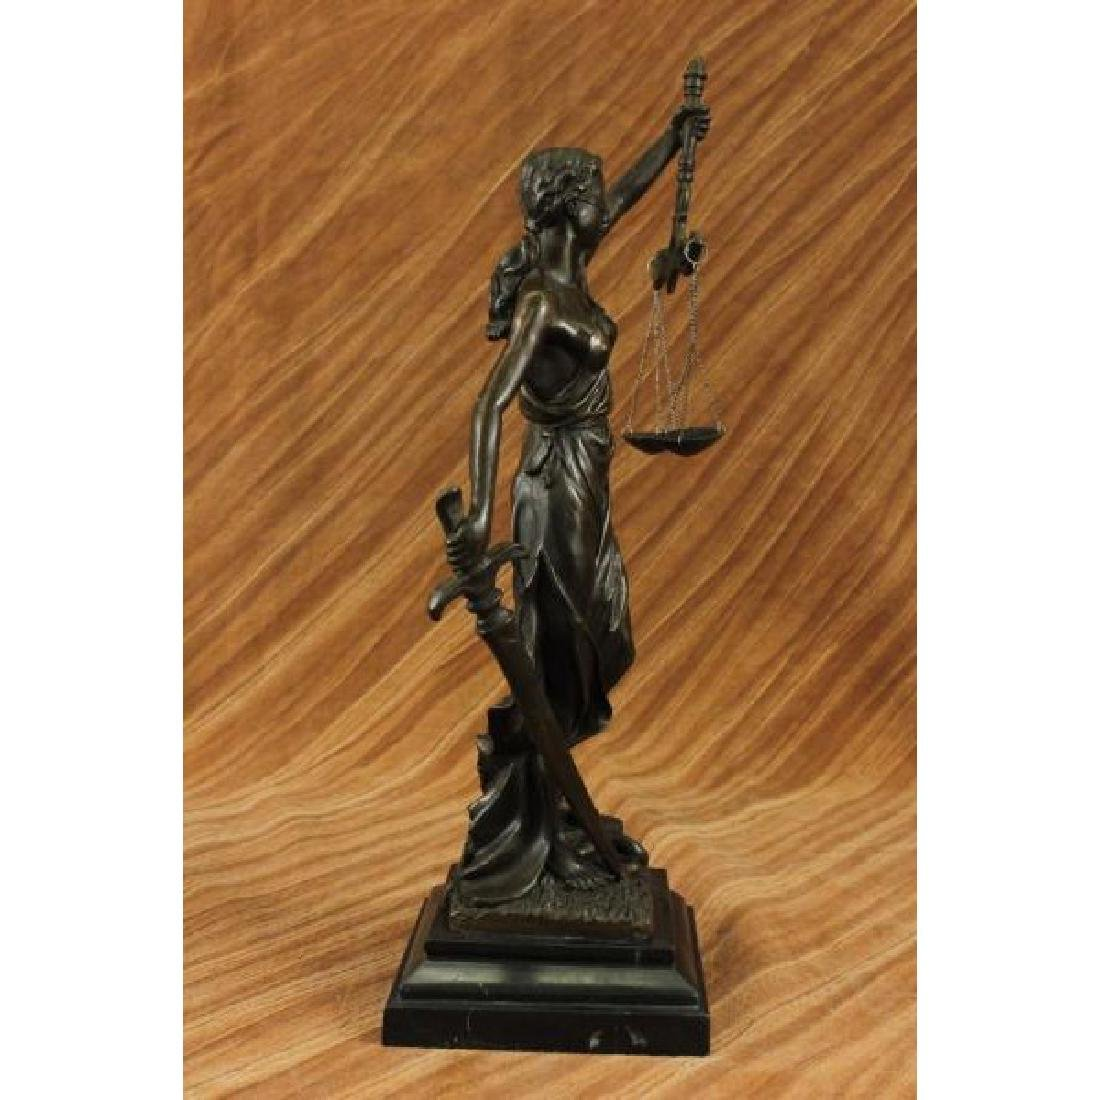 Blind Justice - Scale of Justice Bronze Sculpture - 4